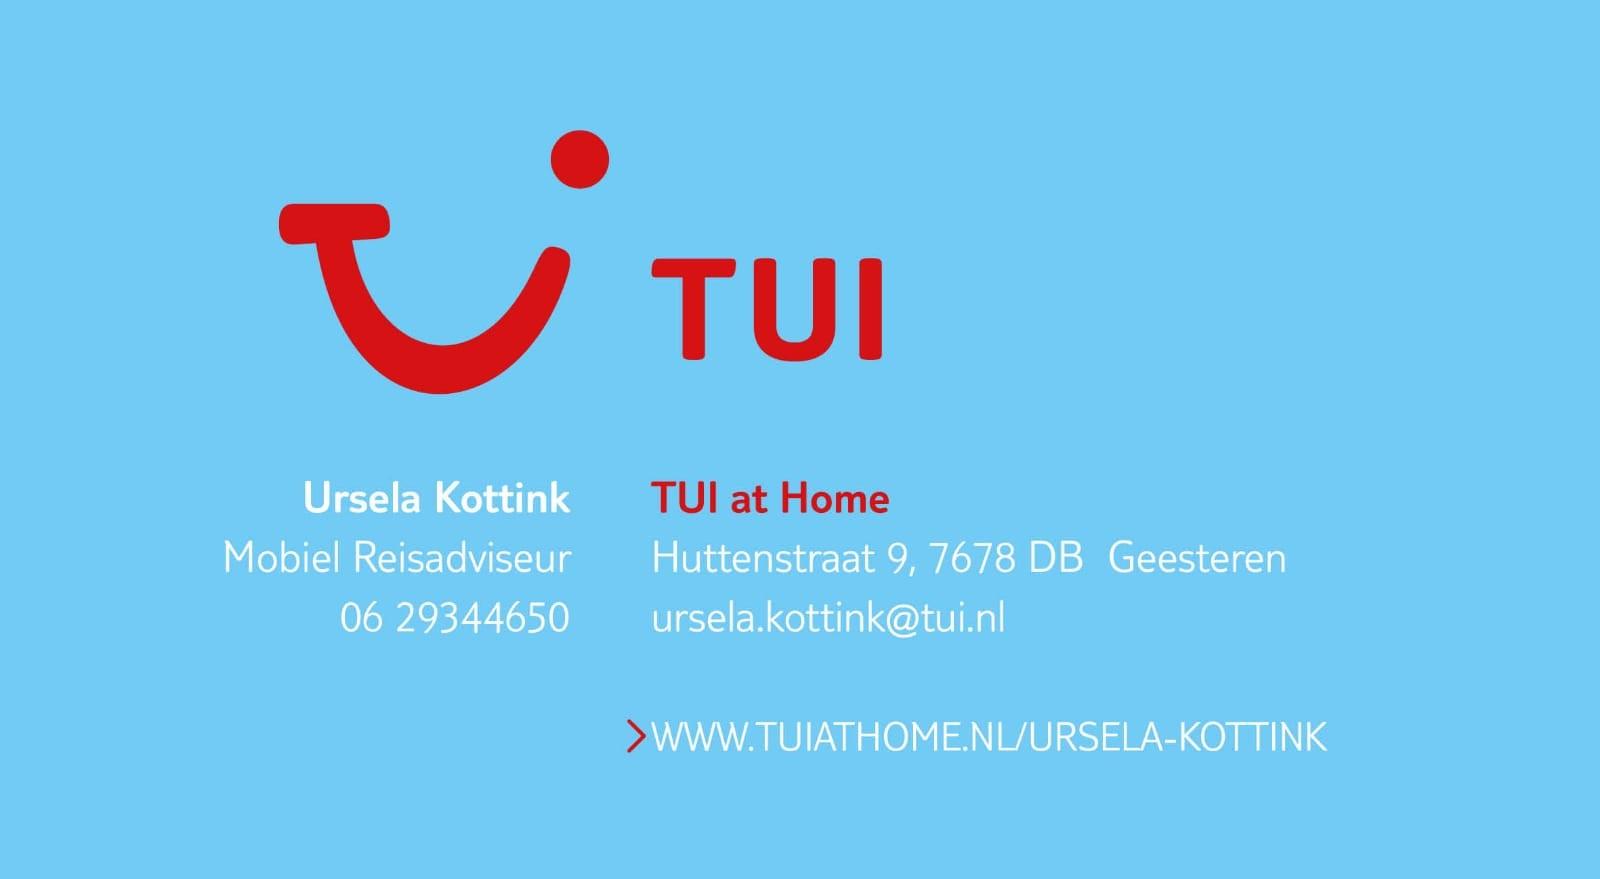 TUI at Home Ursela Kottink